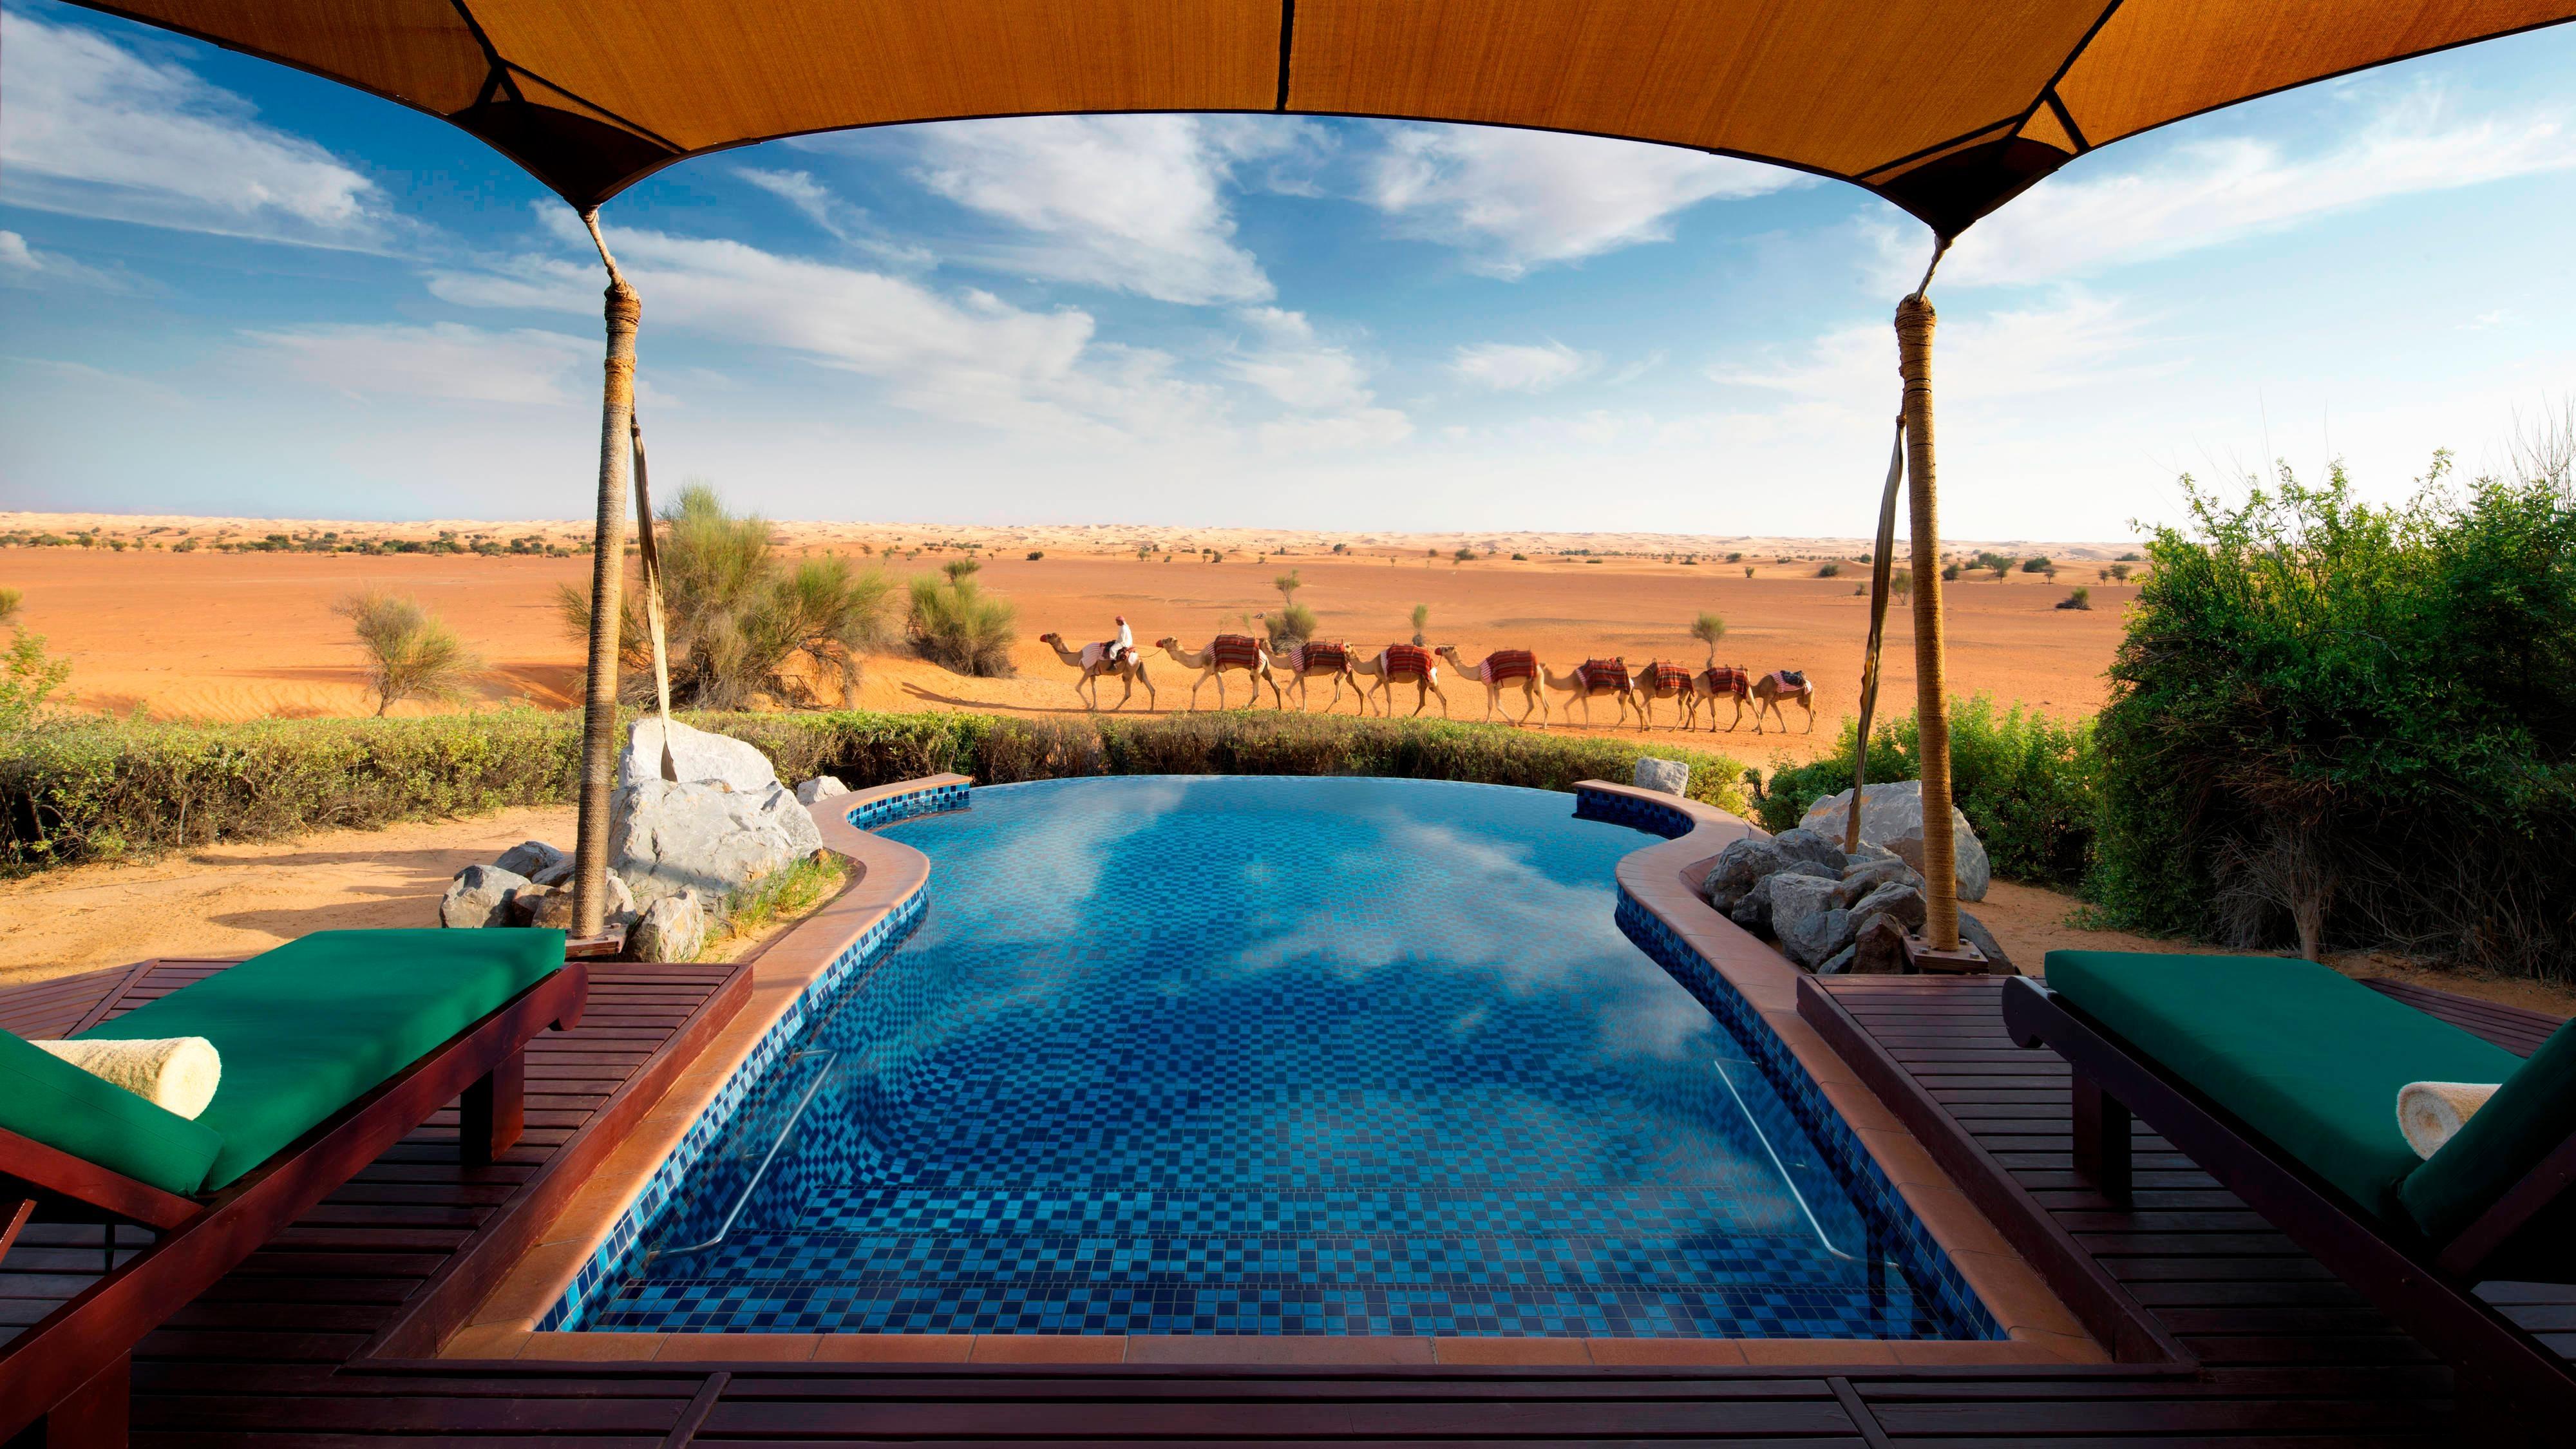 Luxury Hotels & Resorts In Dubai Al Maha